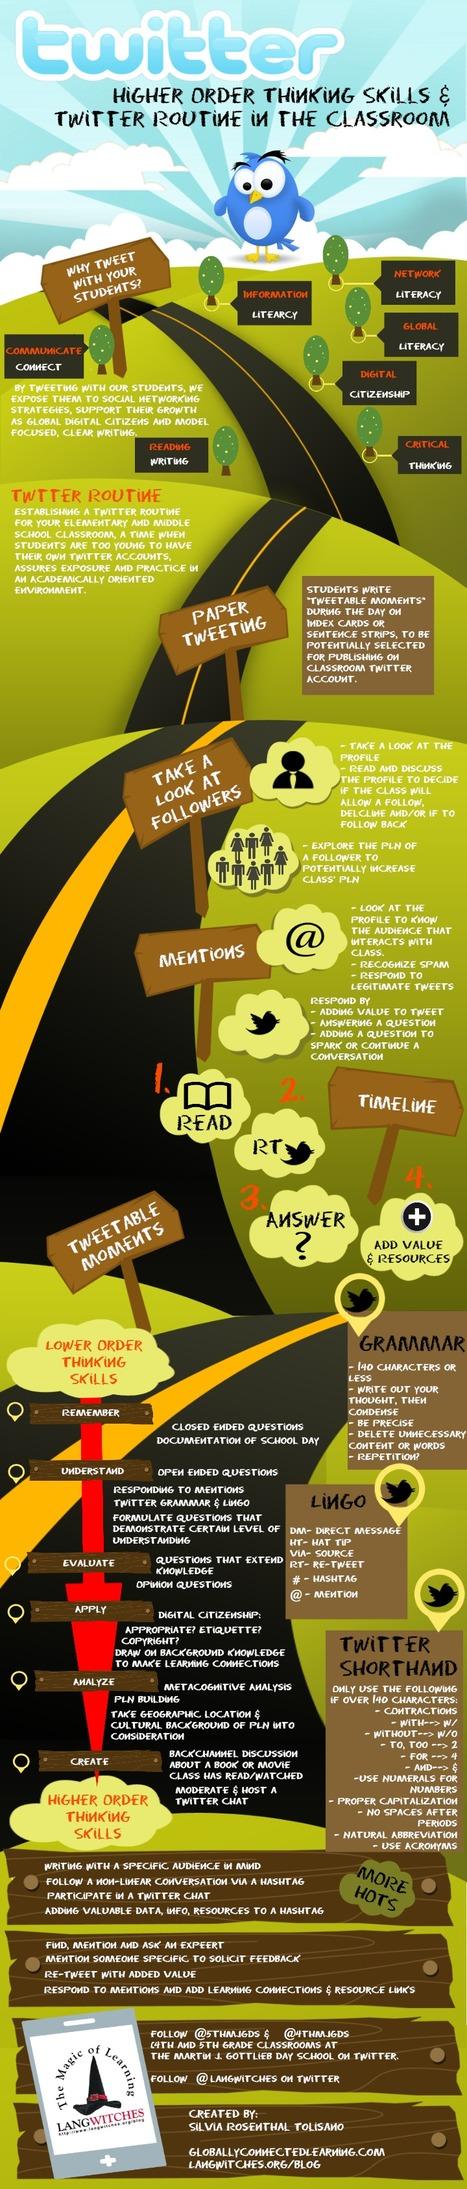 Teachers Roadmap to The Use of Twitter in Education | Wallet Digital - Social Media, Business & Technology | Scoop.it